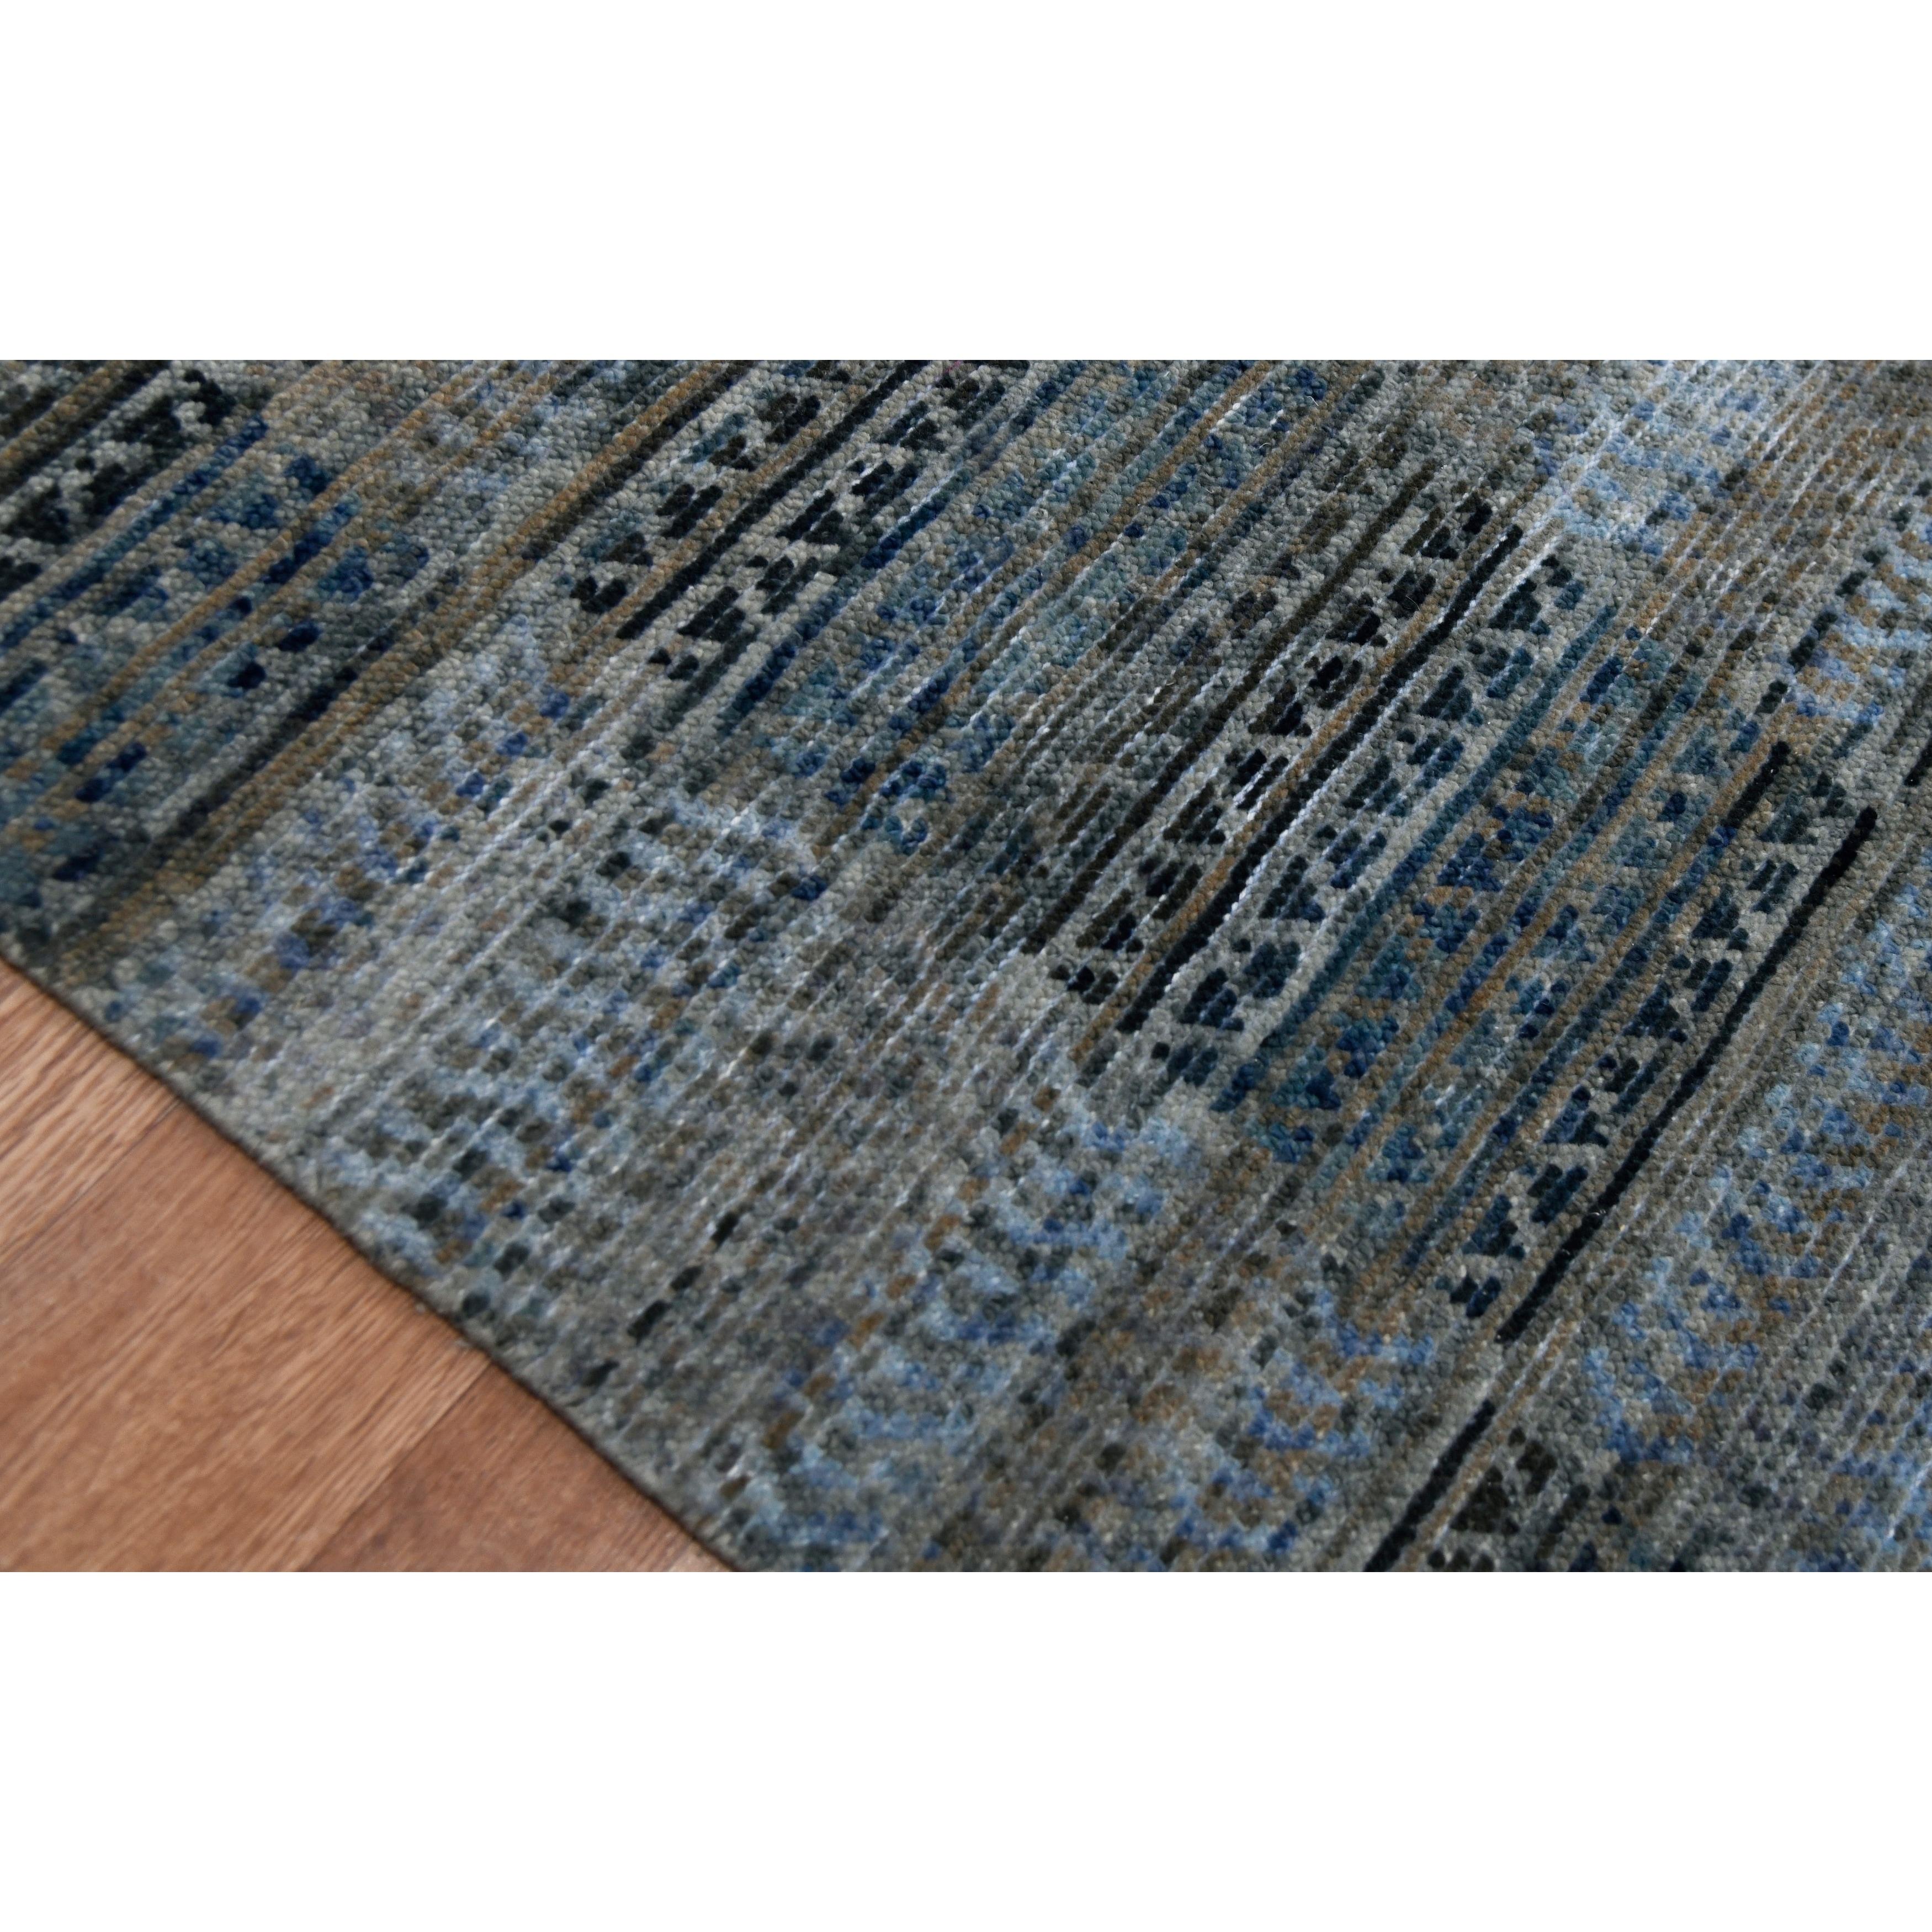 Lara Dee Handmade Knotted Geometric Wool Blend Gray Blue Area Rug Overstock 32324990